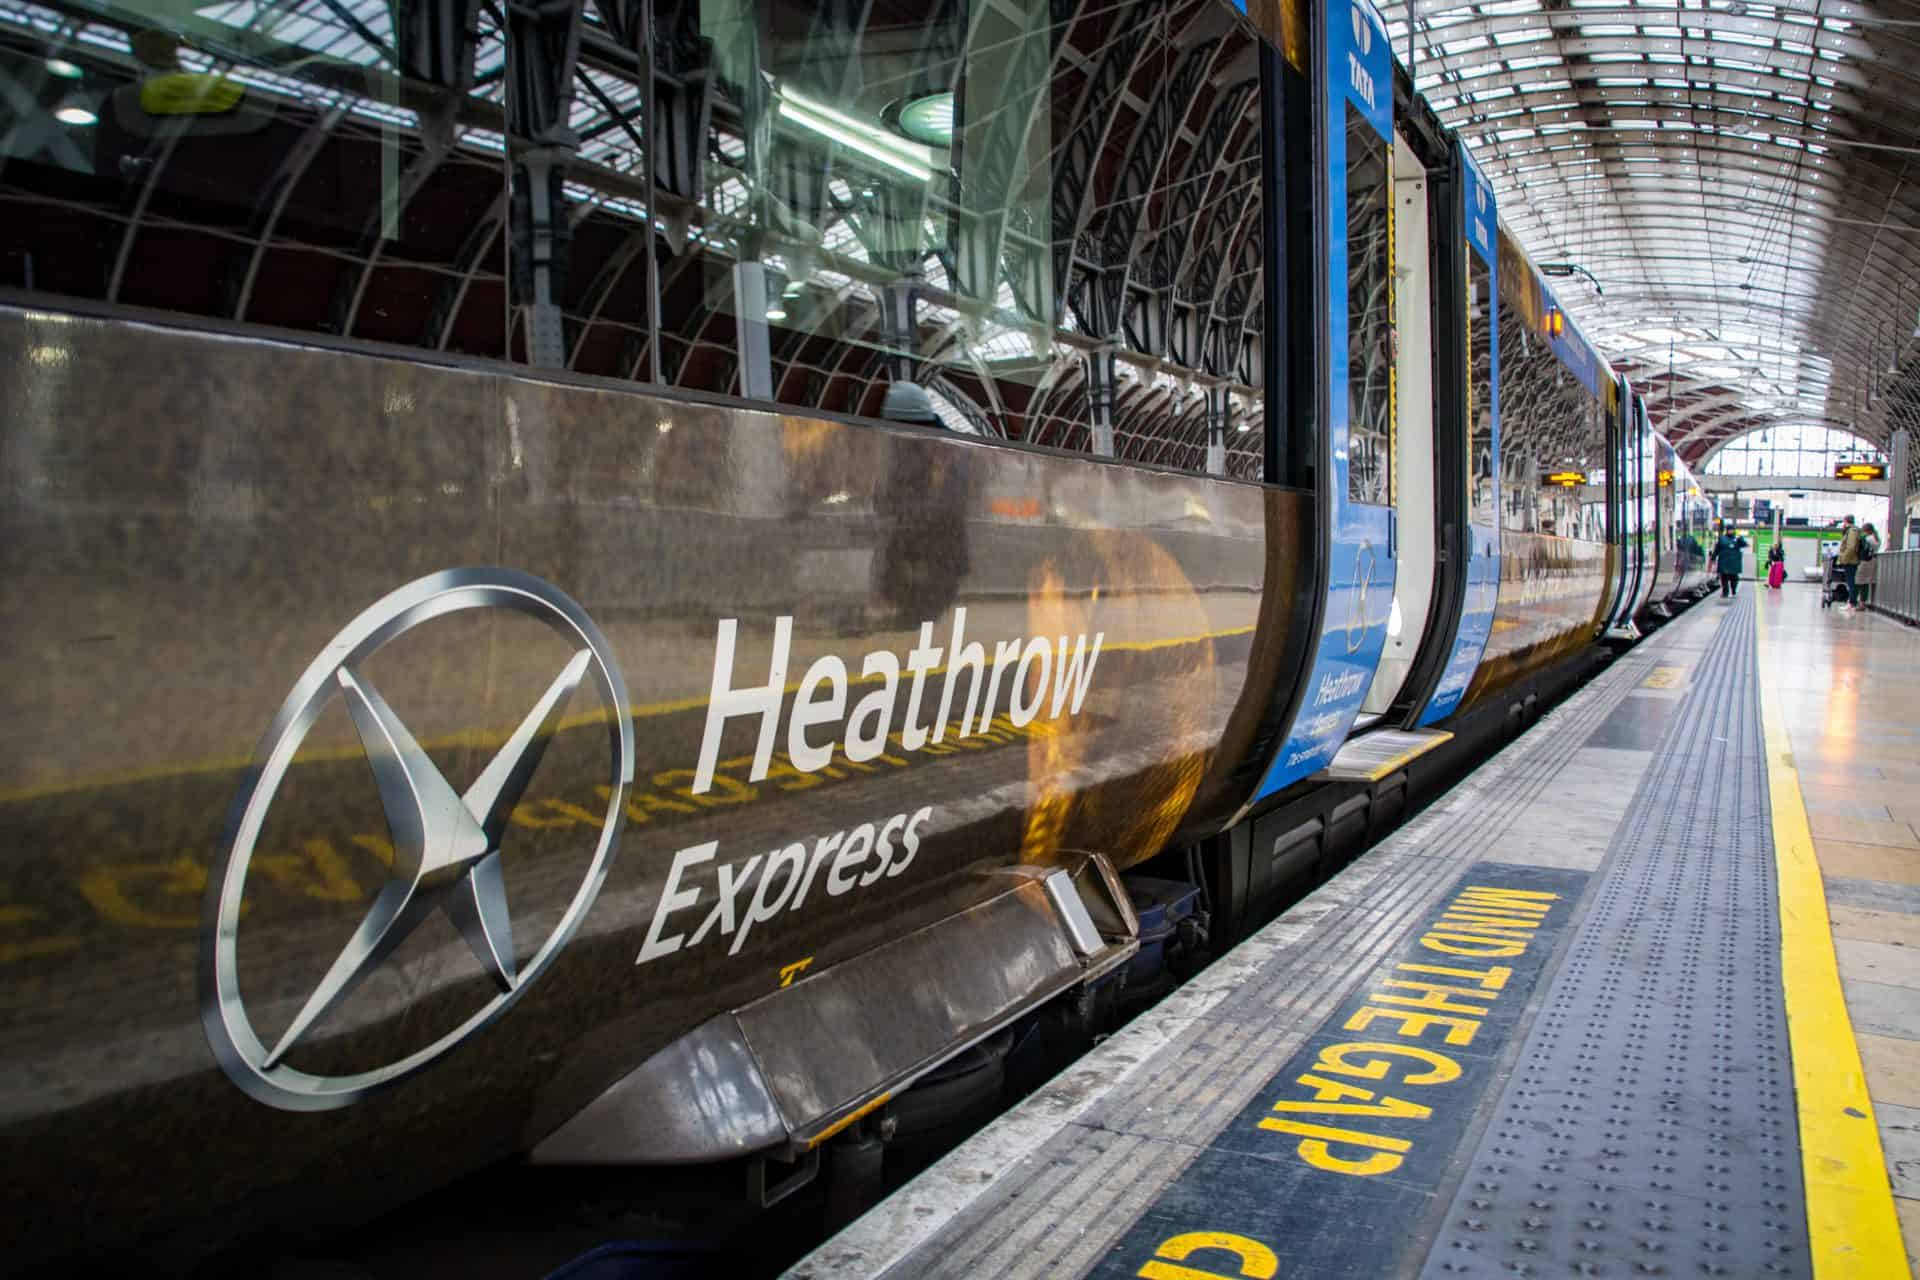 London- Heathrow Express train inside Paddington Station